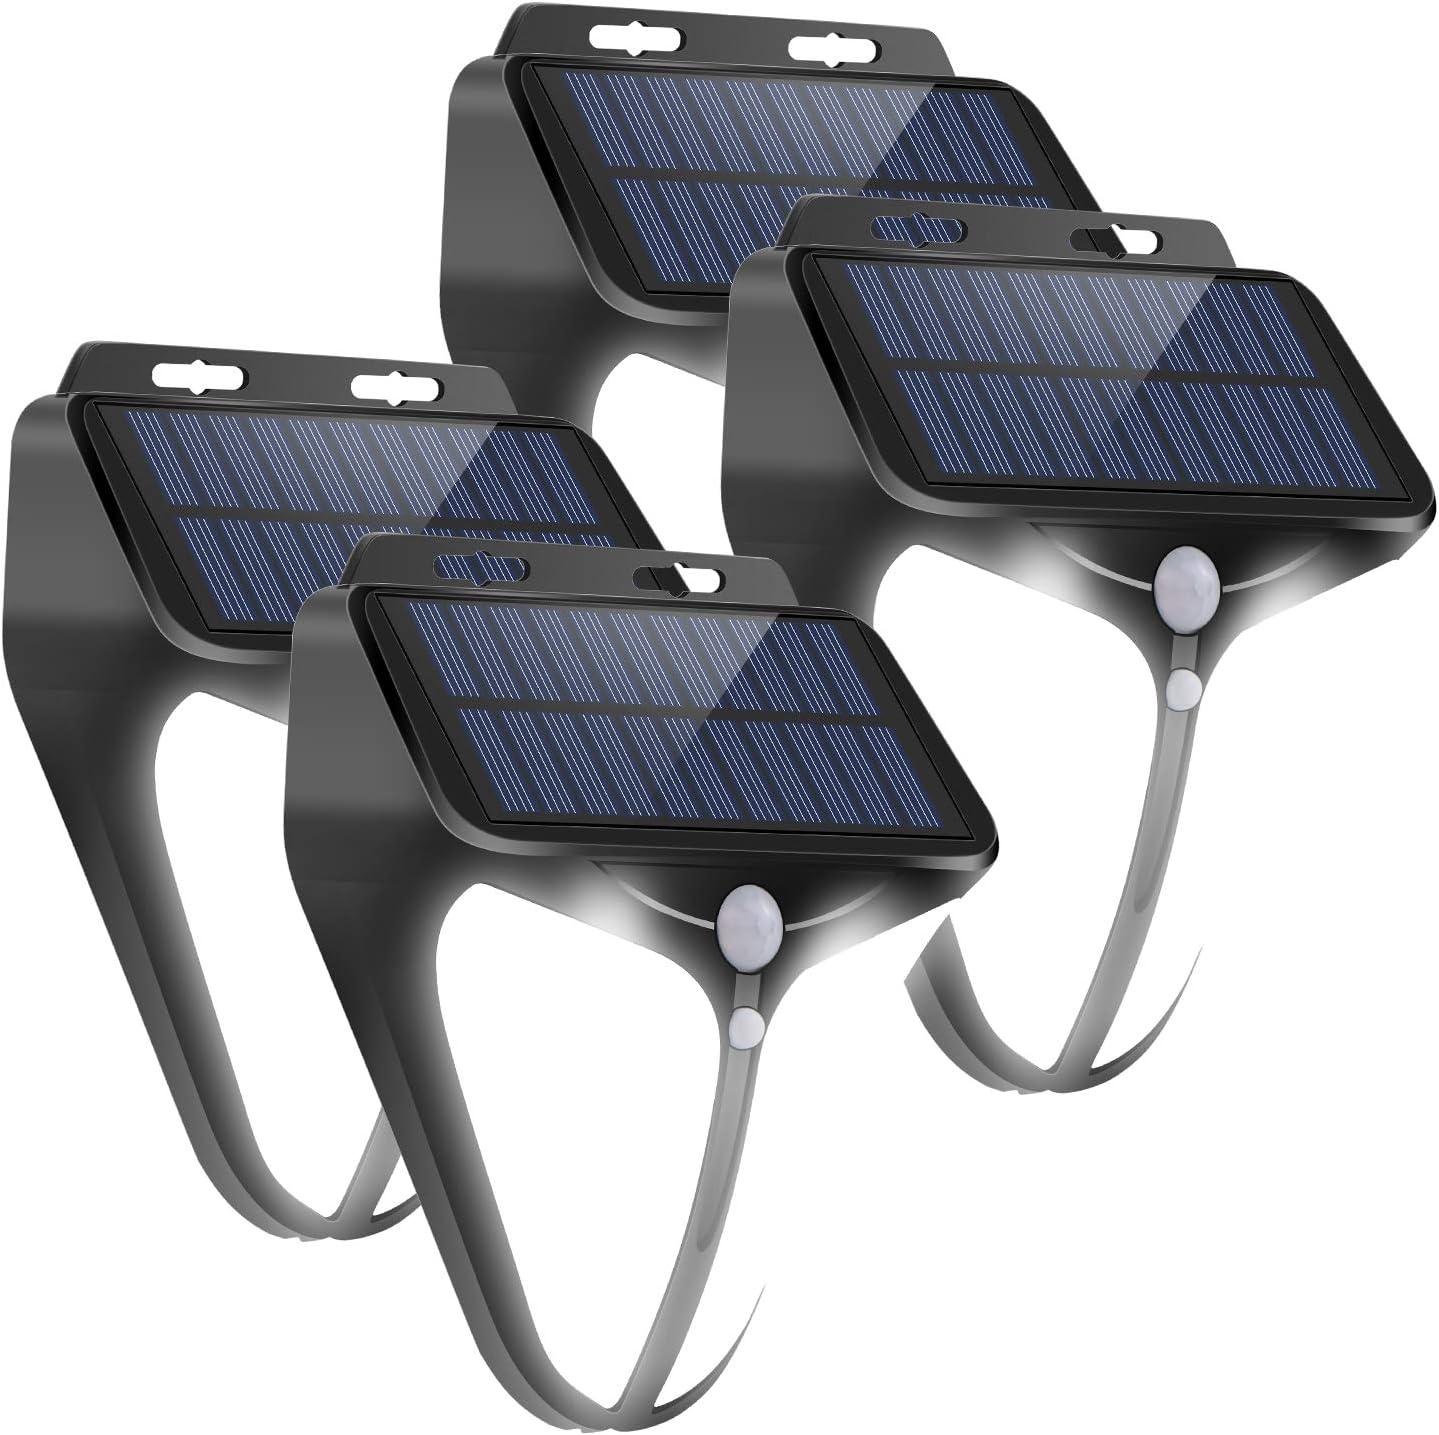 A-Zone Solar Motion Sensor Security Lights